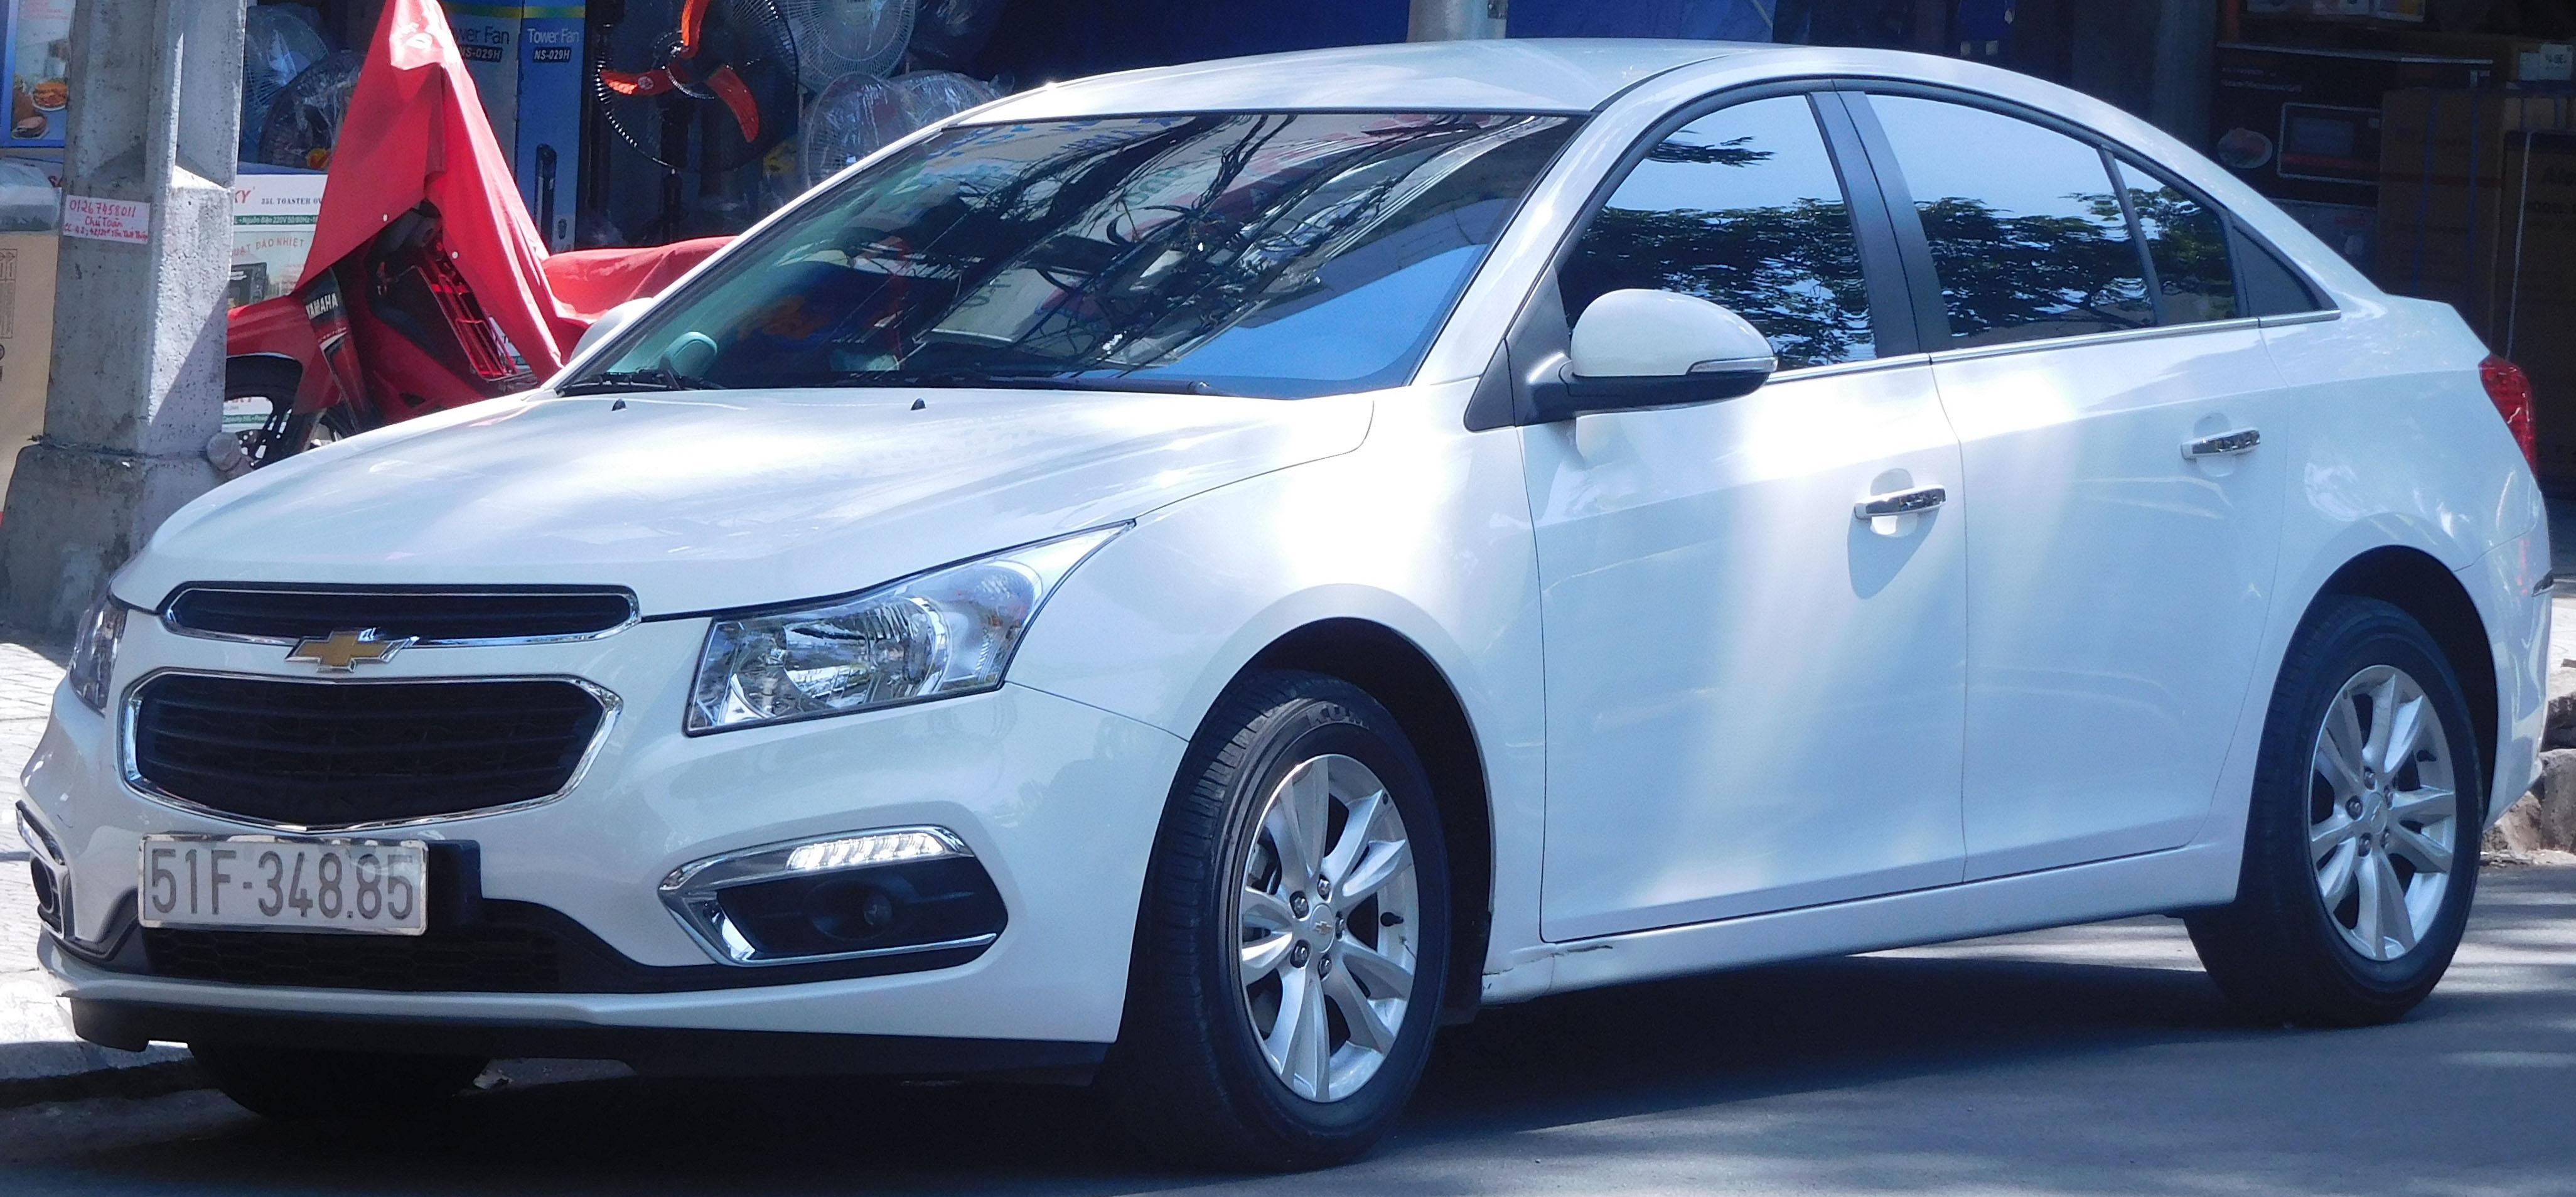 ga low year chevrolet model make atlanta usautomobile may used automatic cruze ls miles